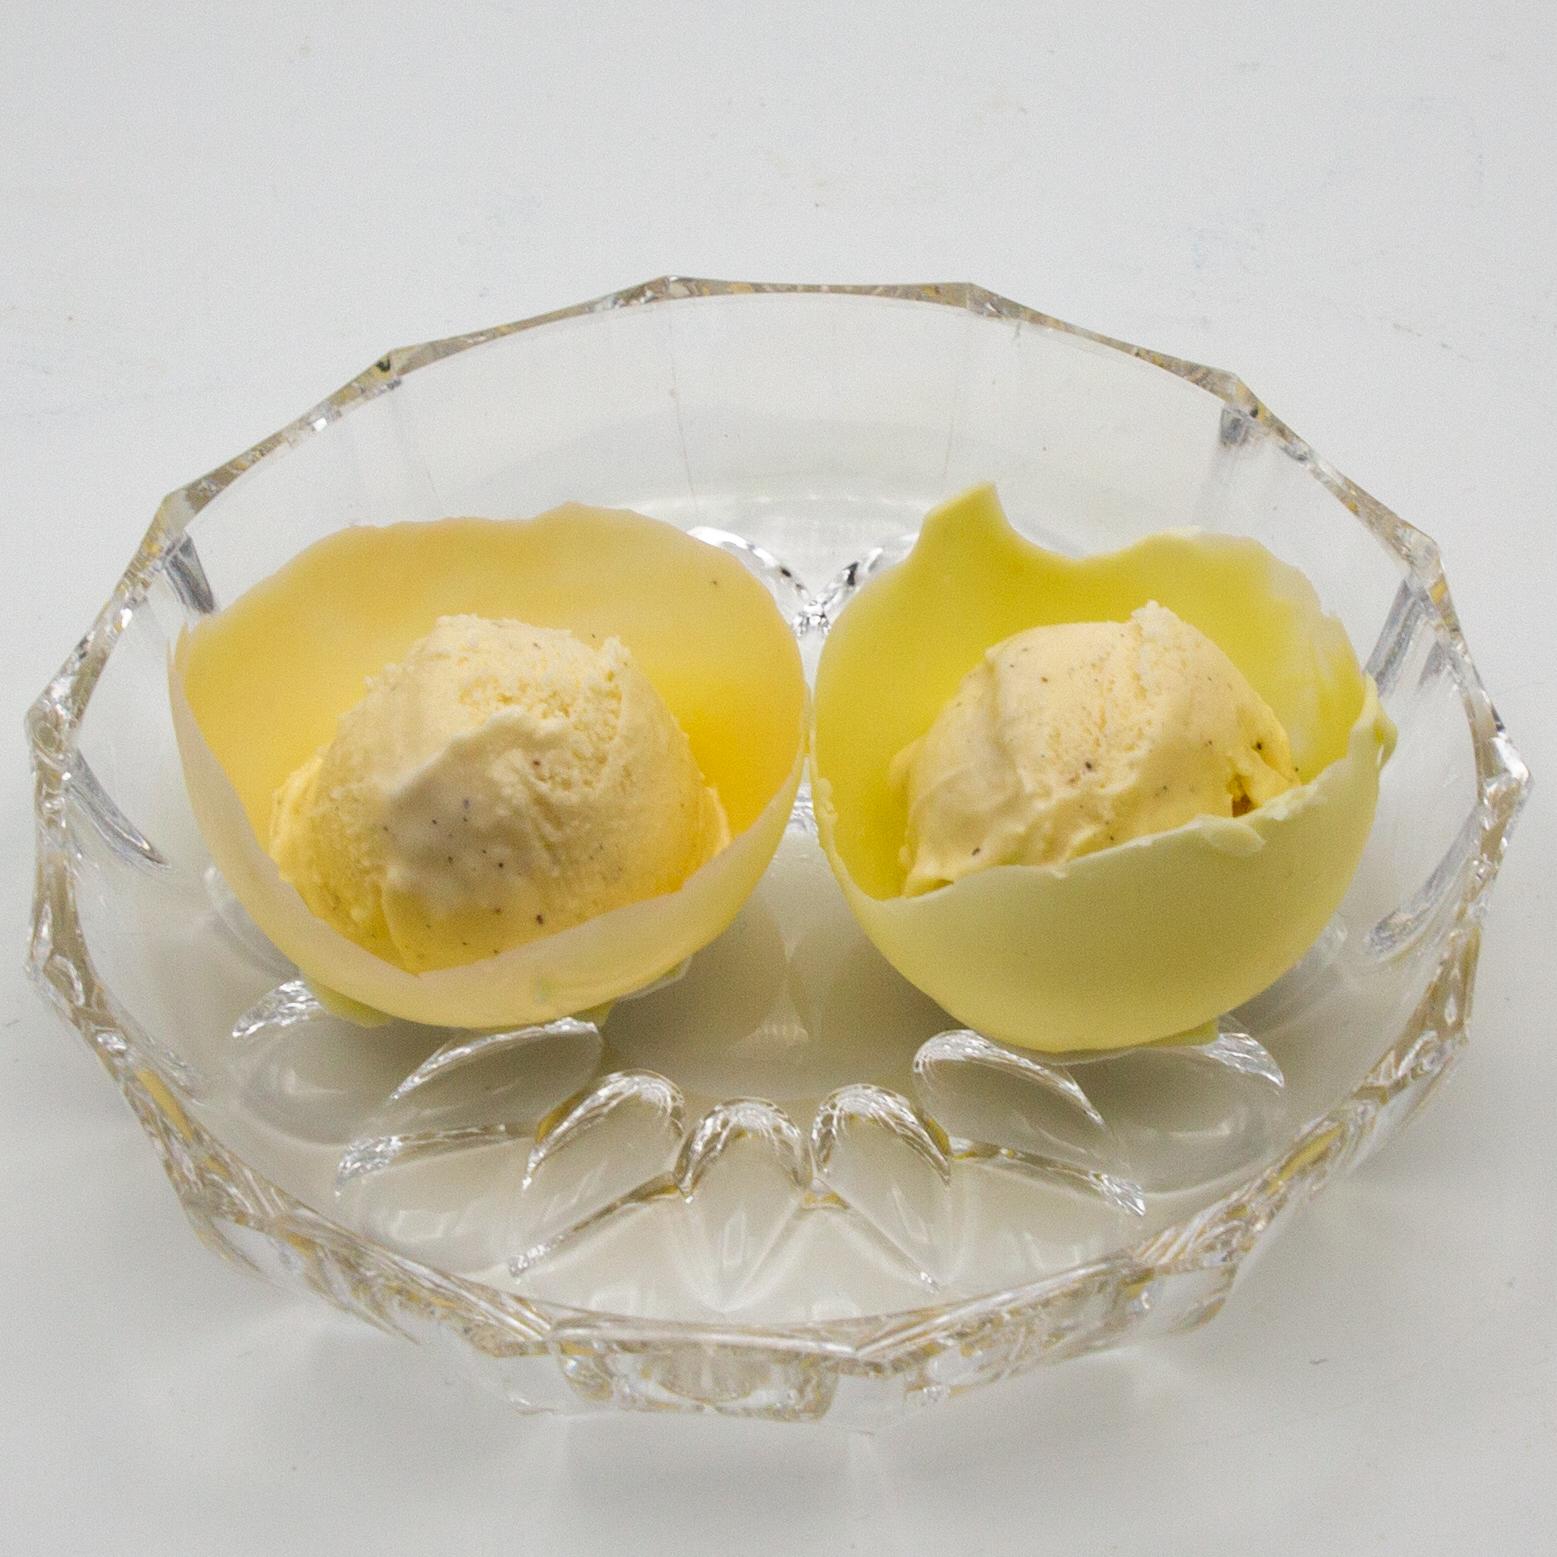 Put vanilla ice cream balls into the white chocolate bowls.